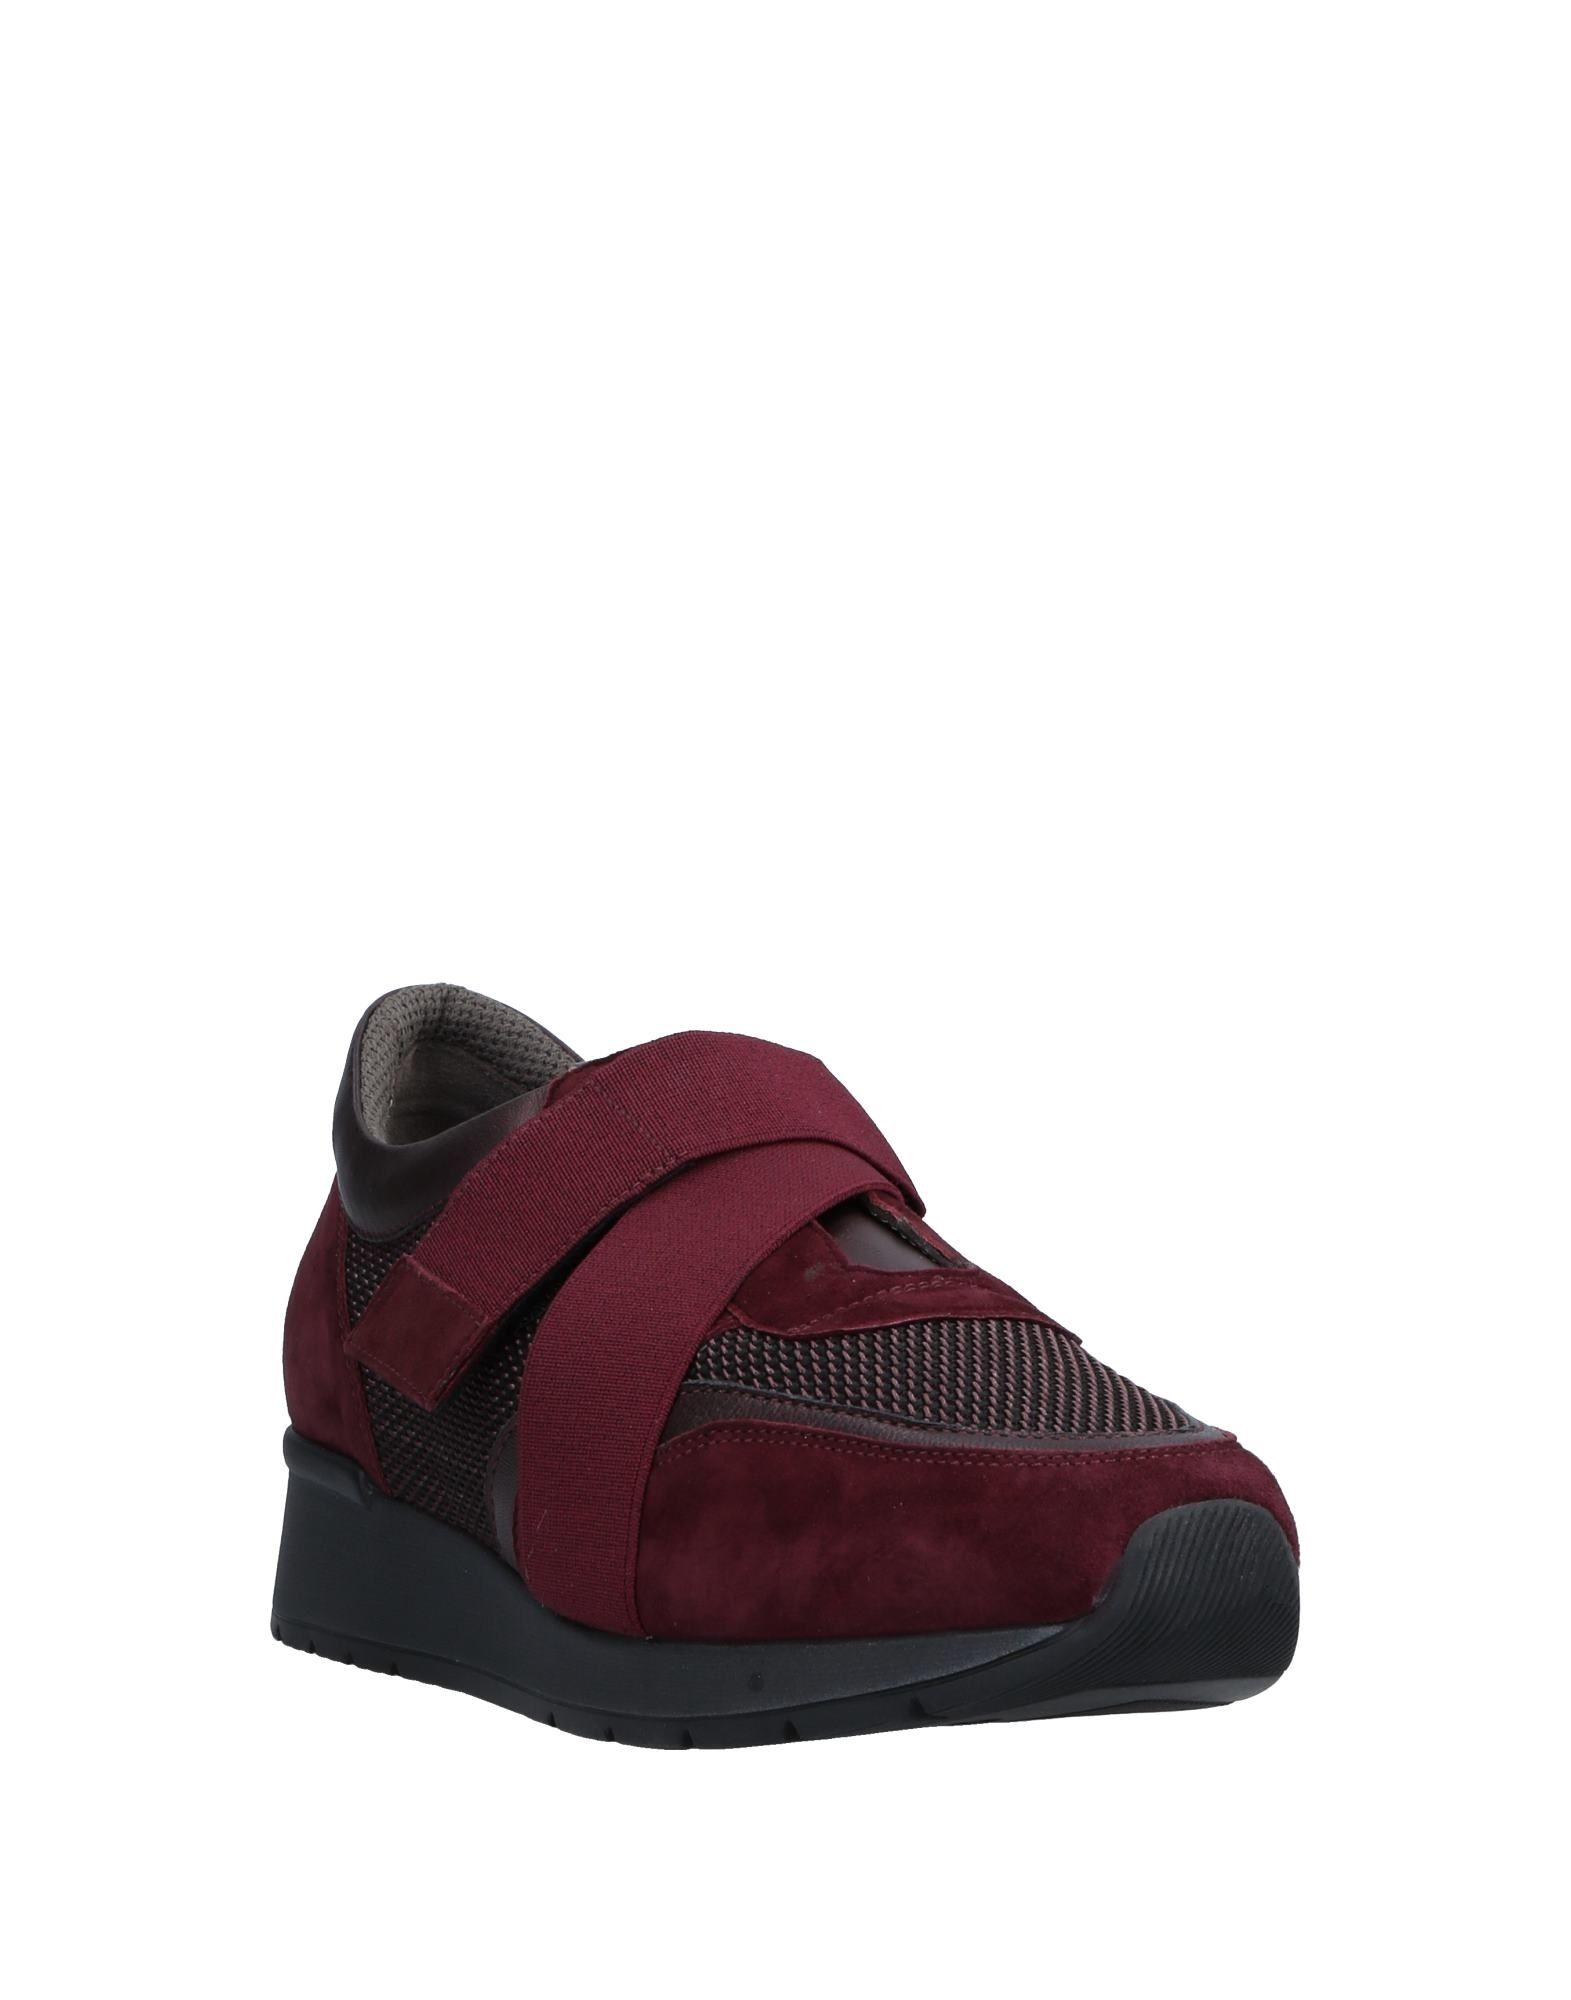 Walk By Melluso Qualität Sneakers Damen  11536388UH Gute Qualität Melluso beliebte Schuhe 9ec1b6